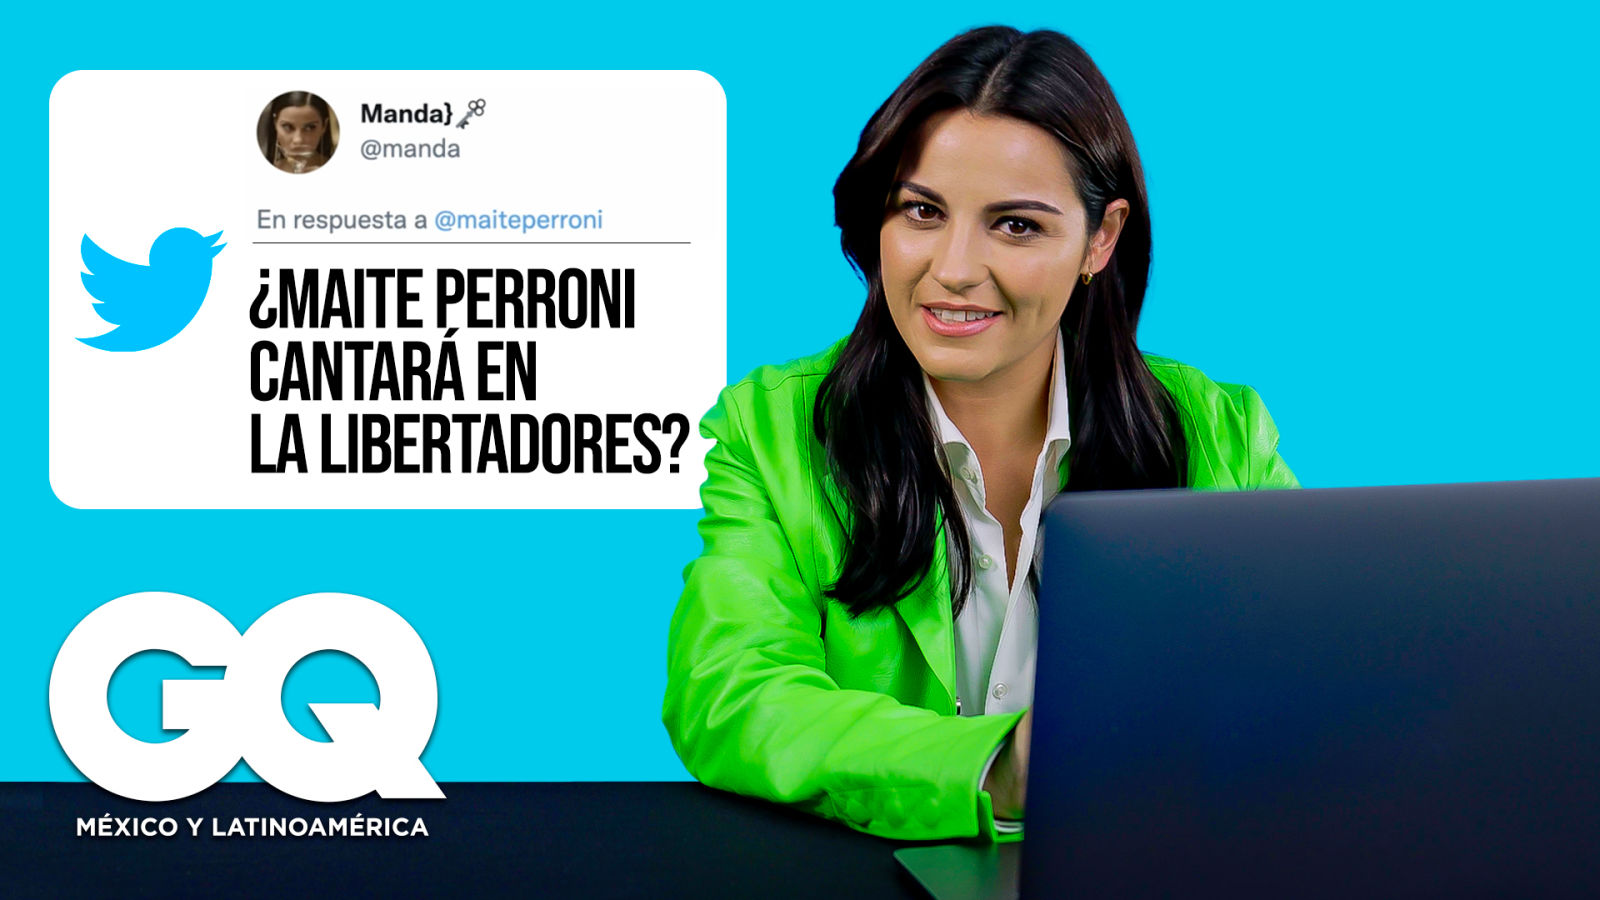 Maite Perroni entra de encubierta a Internet para contestar preguntas